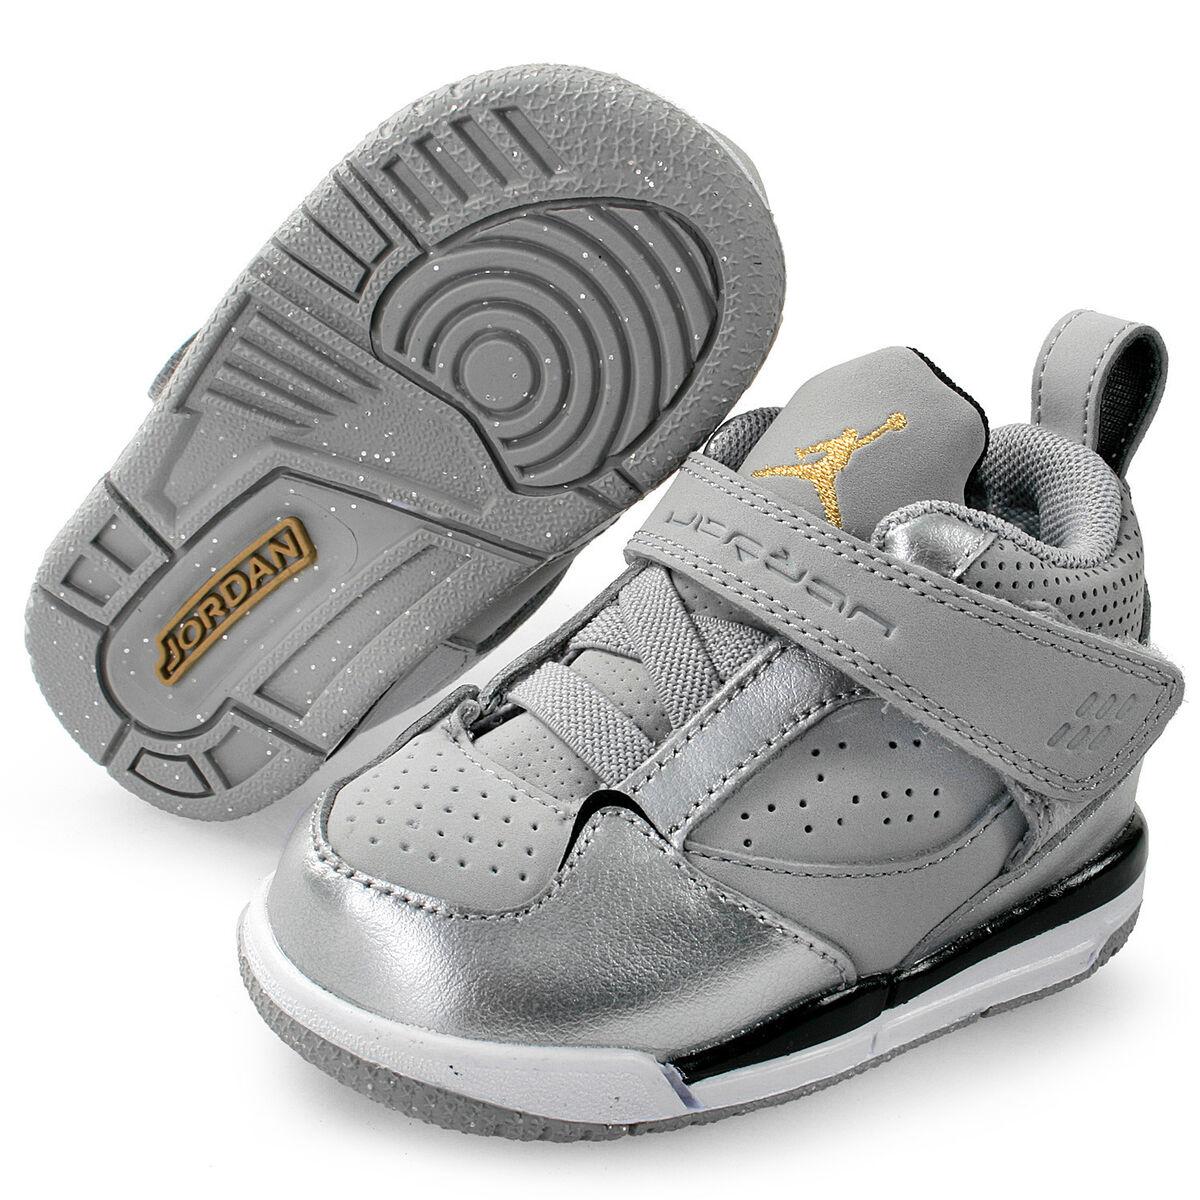 5be45bc65d1a08 Nike Jordan Flight 45 TD Toddler Shoes Size 3c Baby Boys Girls 886550798006